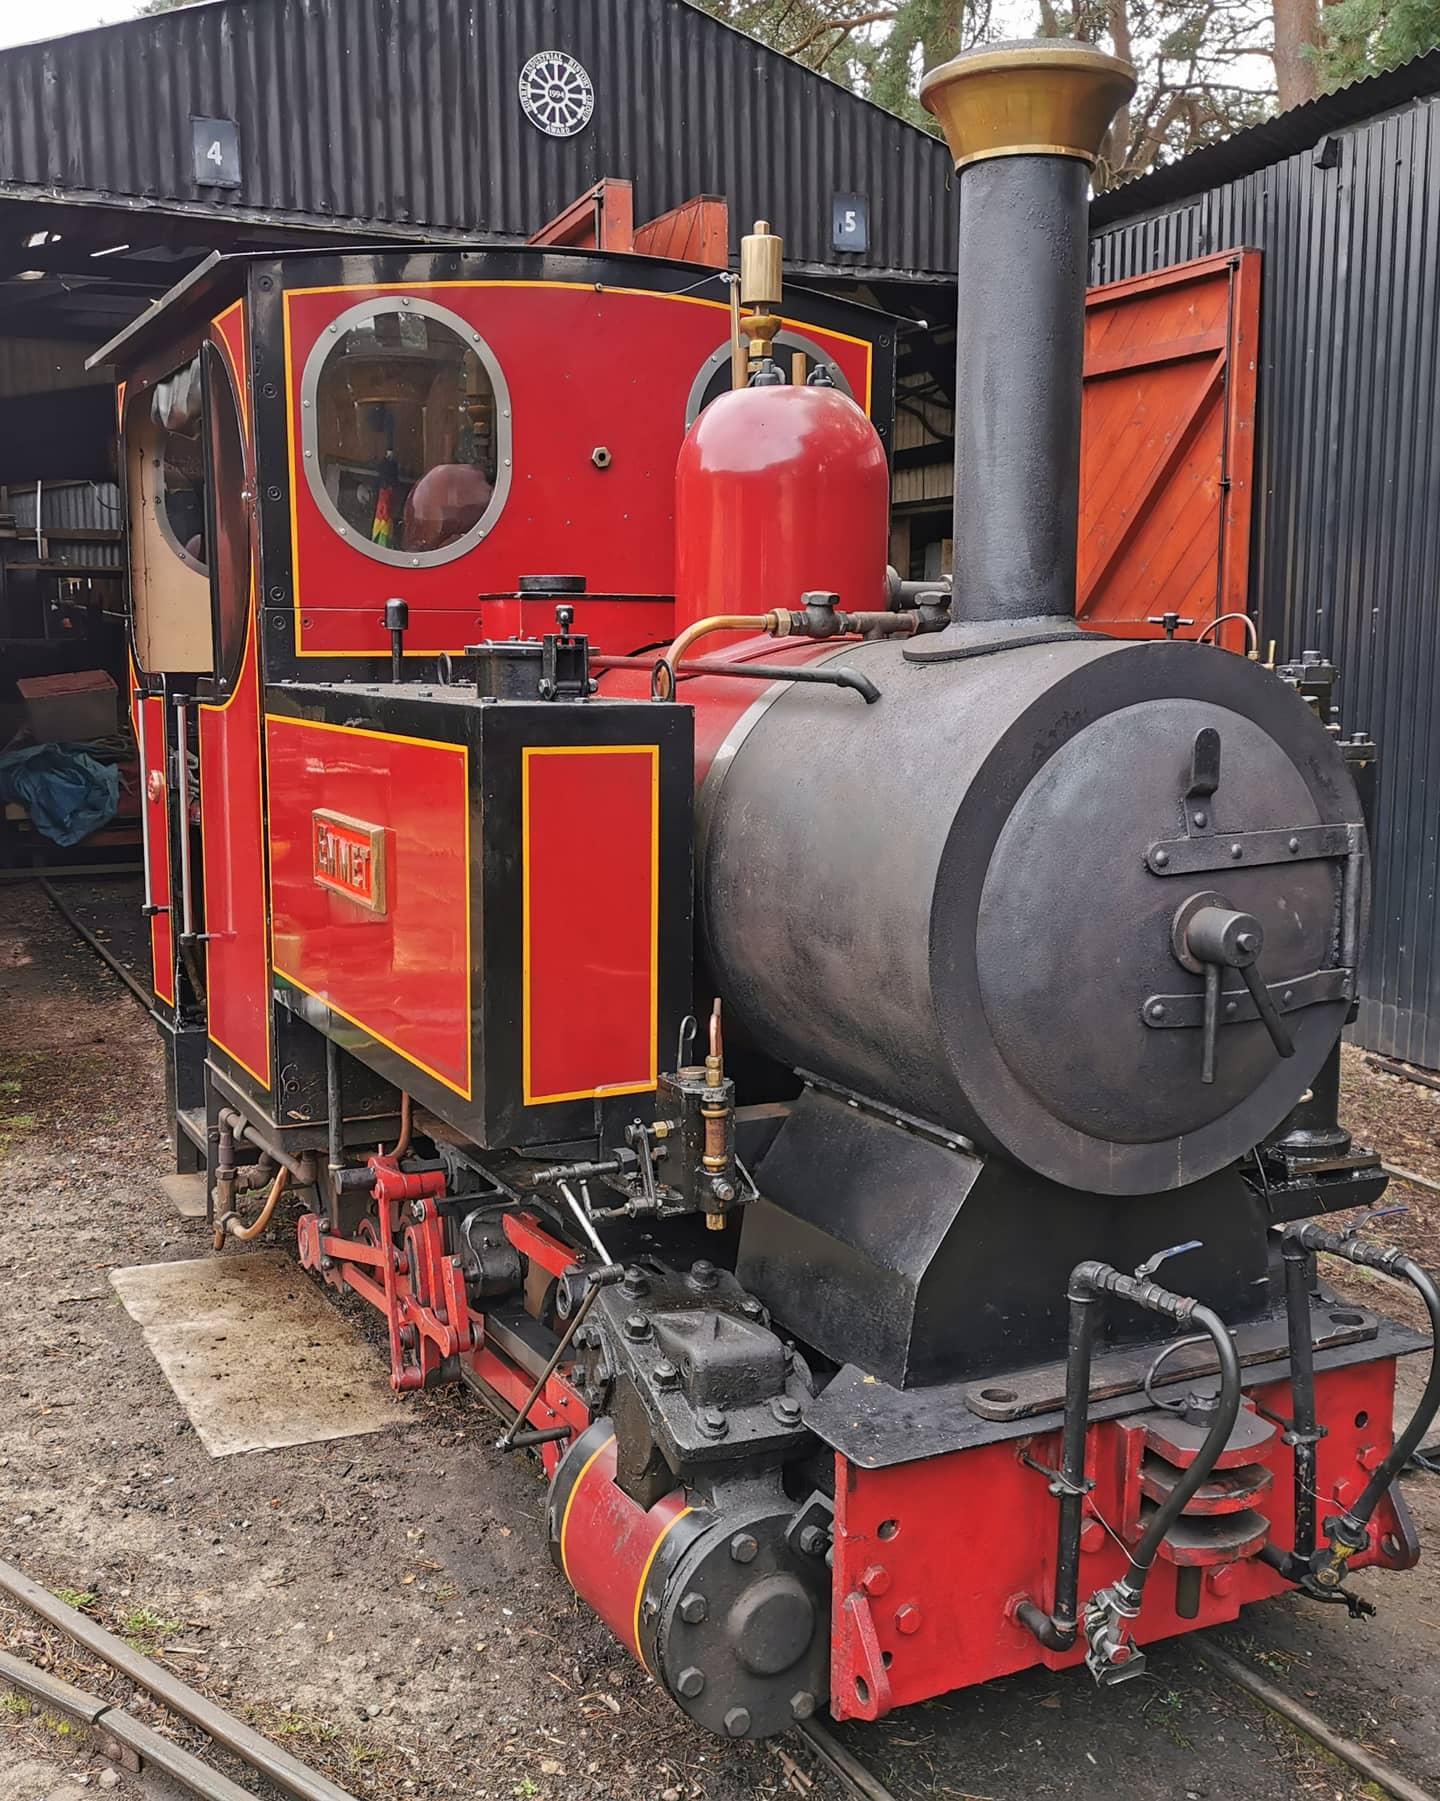 Railway Wednesdays